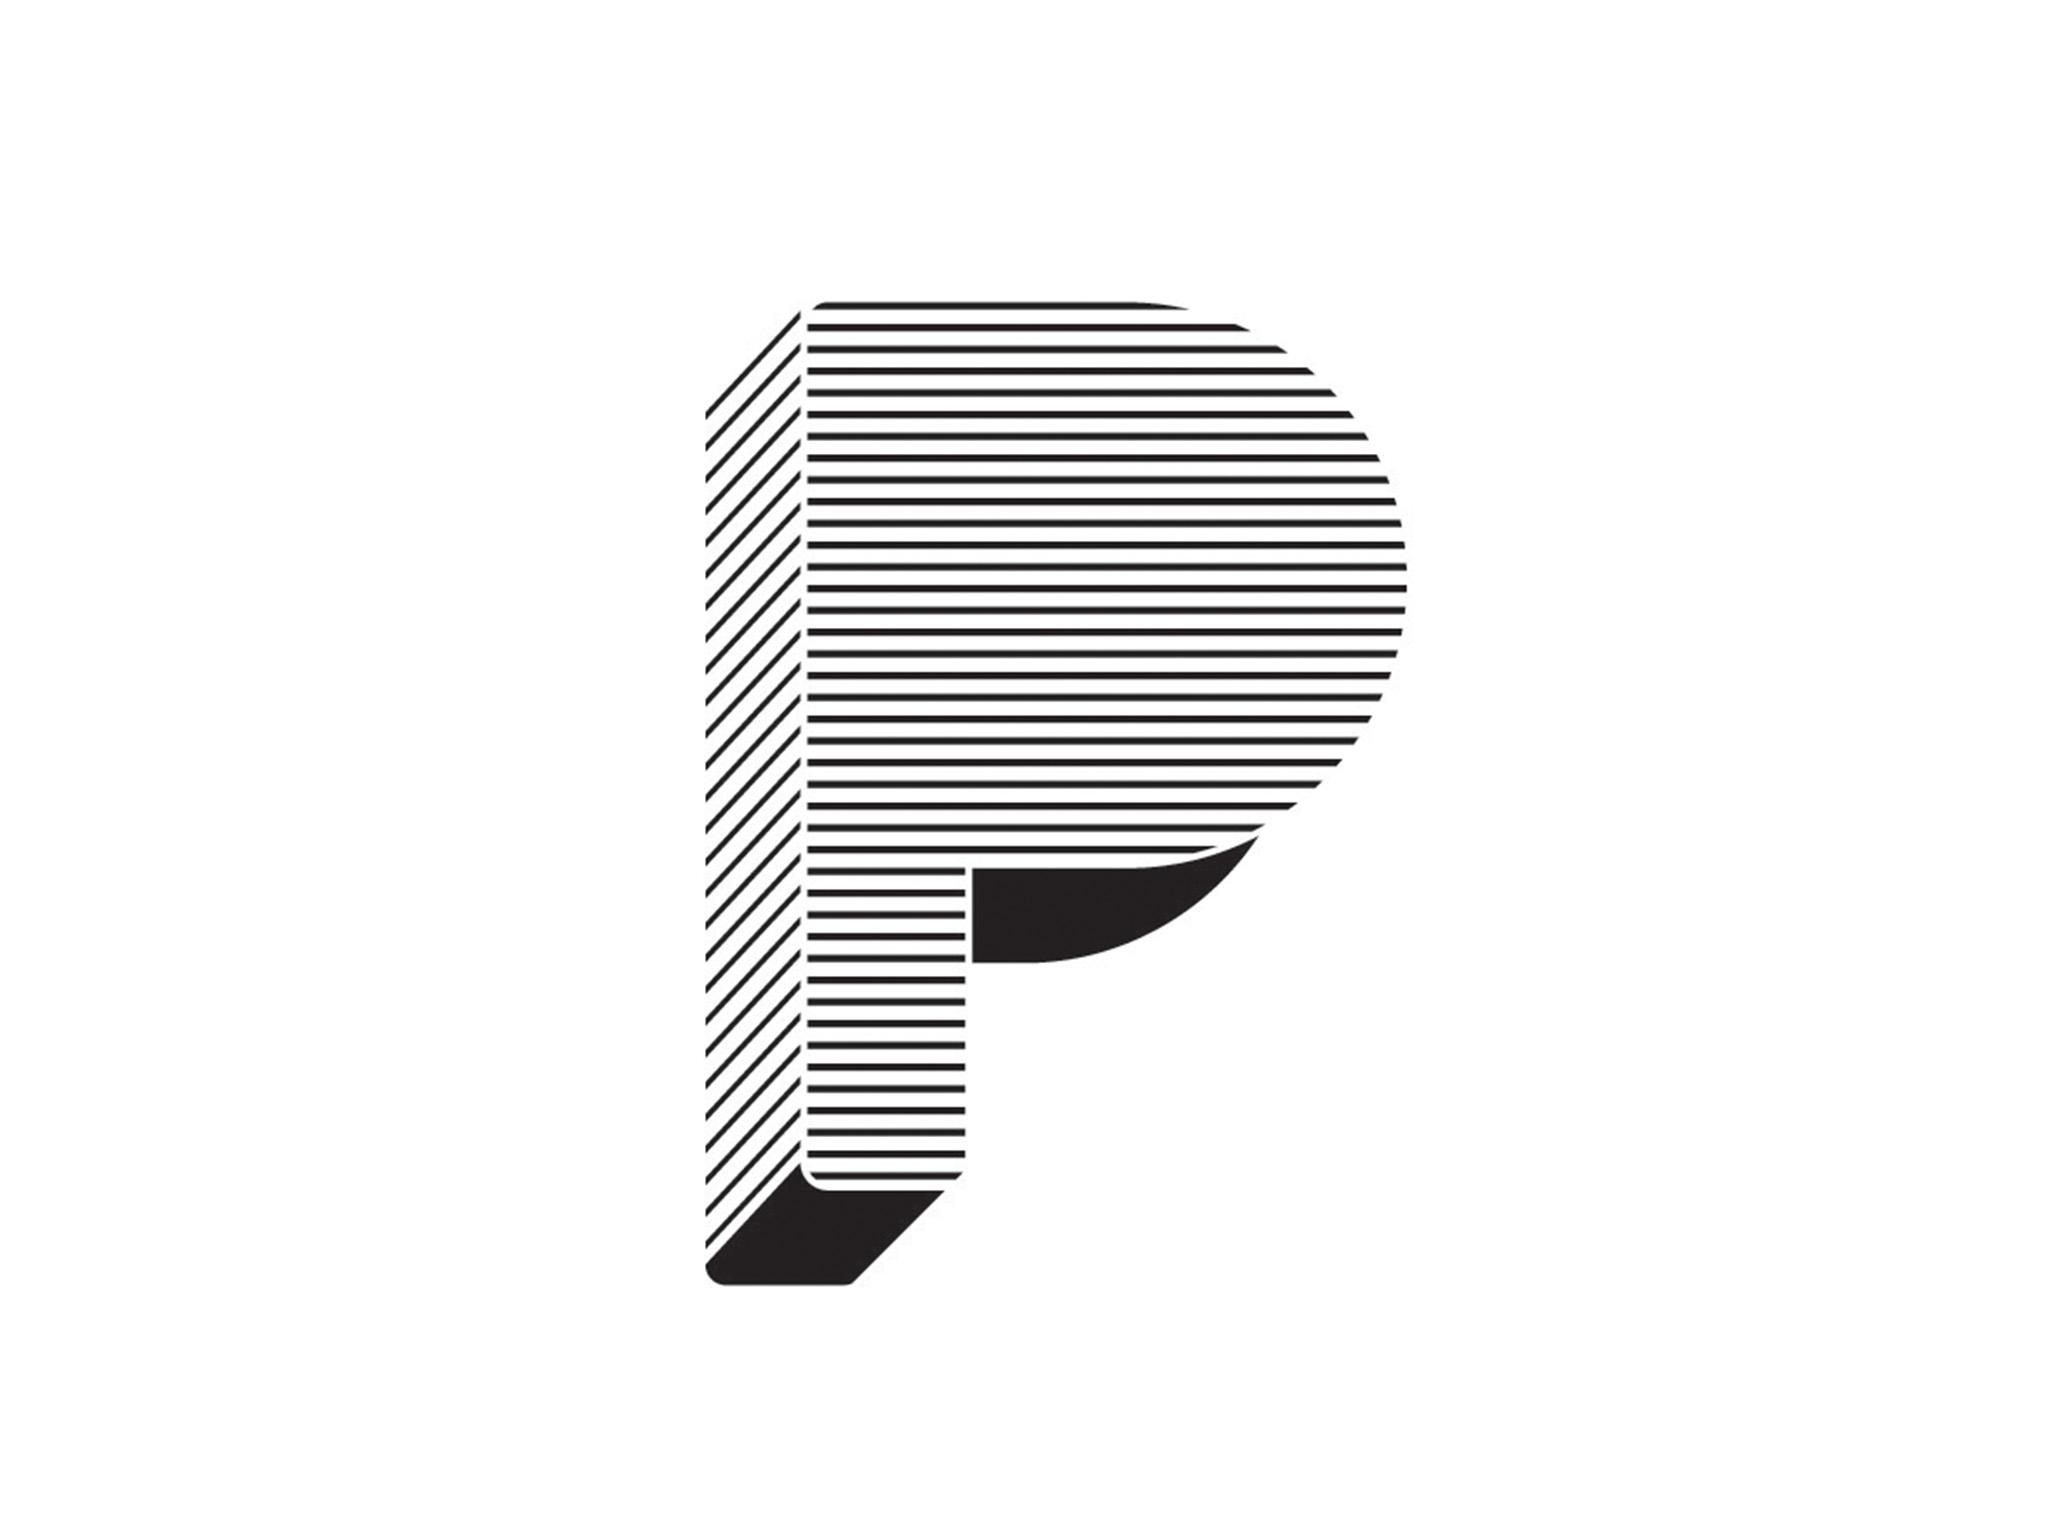 apex_letters_horizontal_large_0024_2_final_alphabet coasters-16.jpg